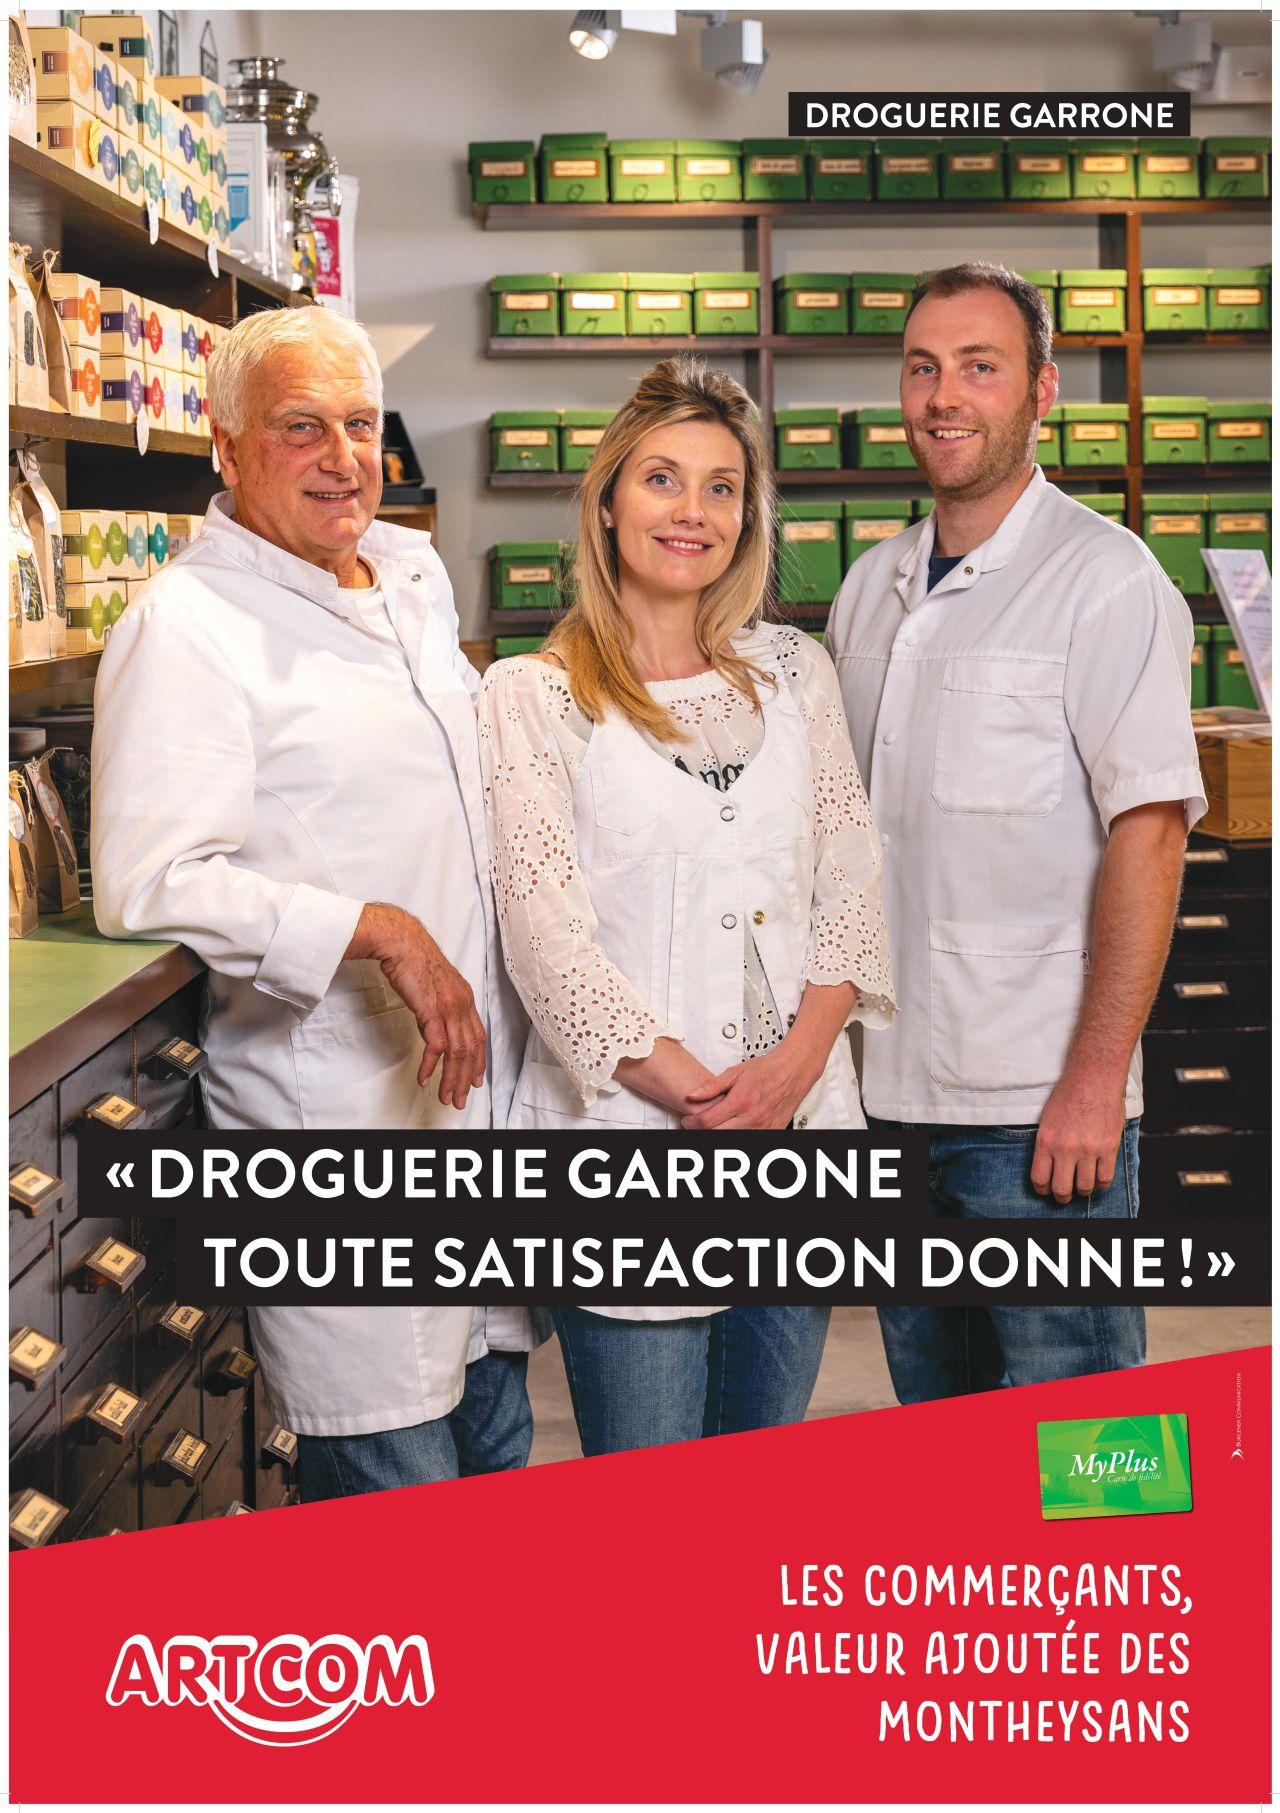 Affiche Droguerie Garonne